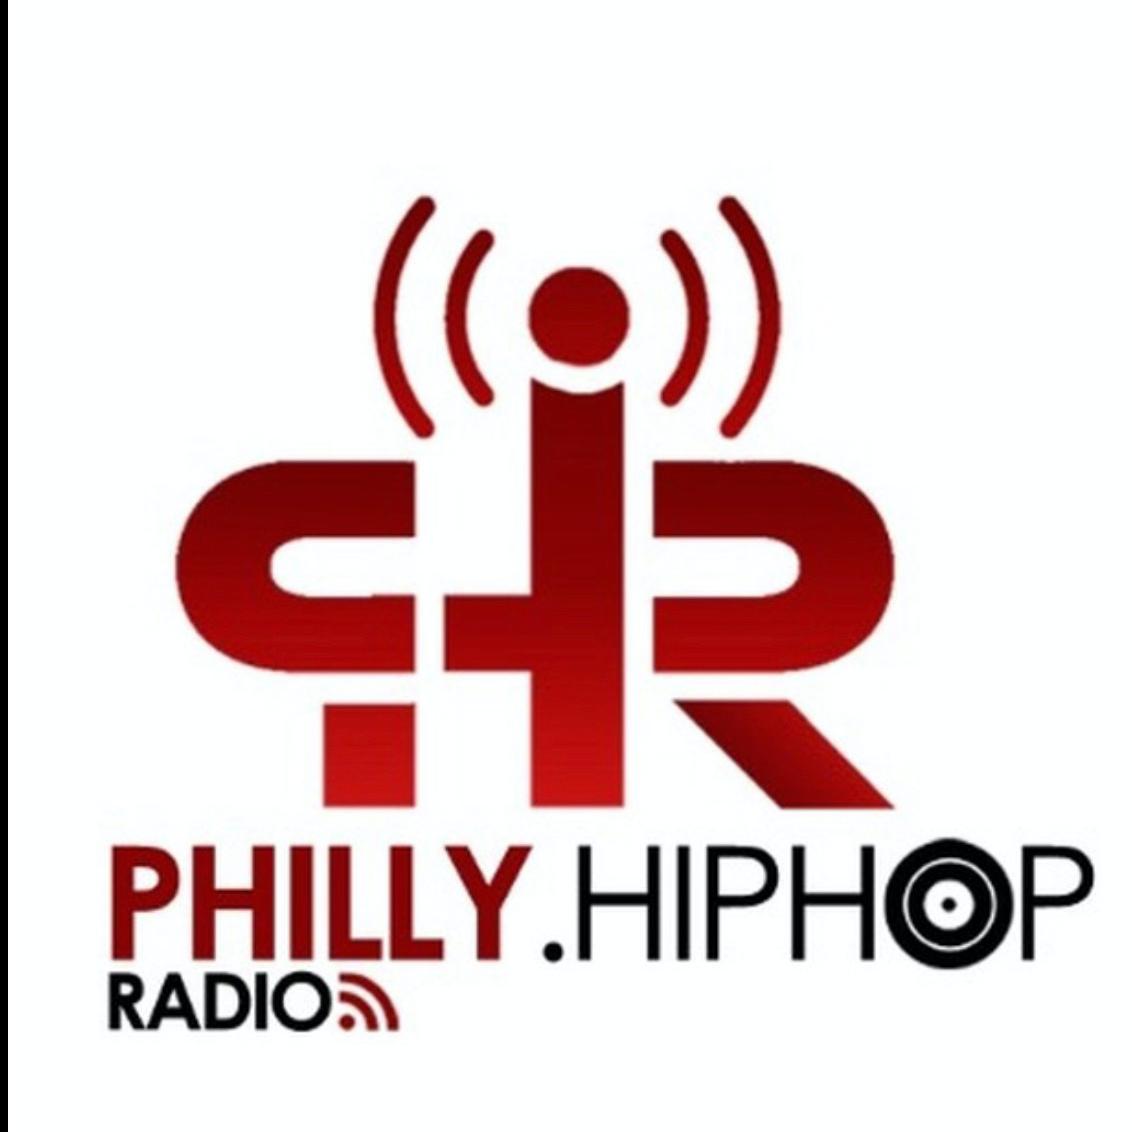 phillyhiphop radio